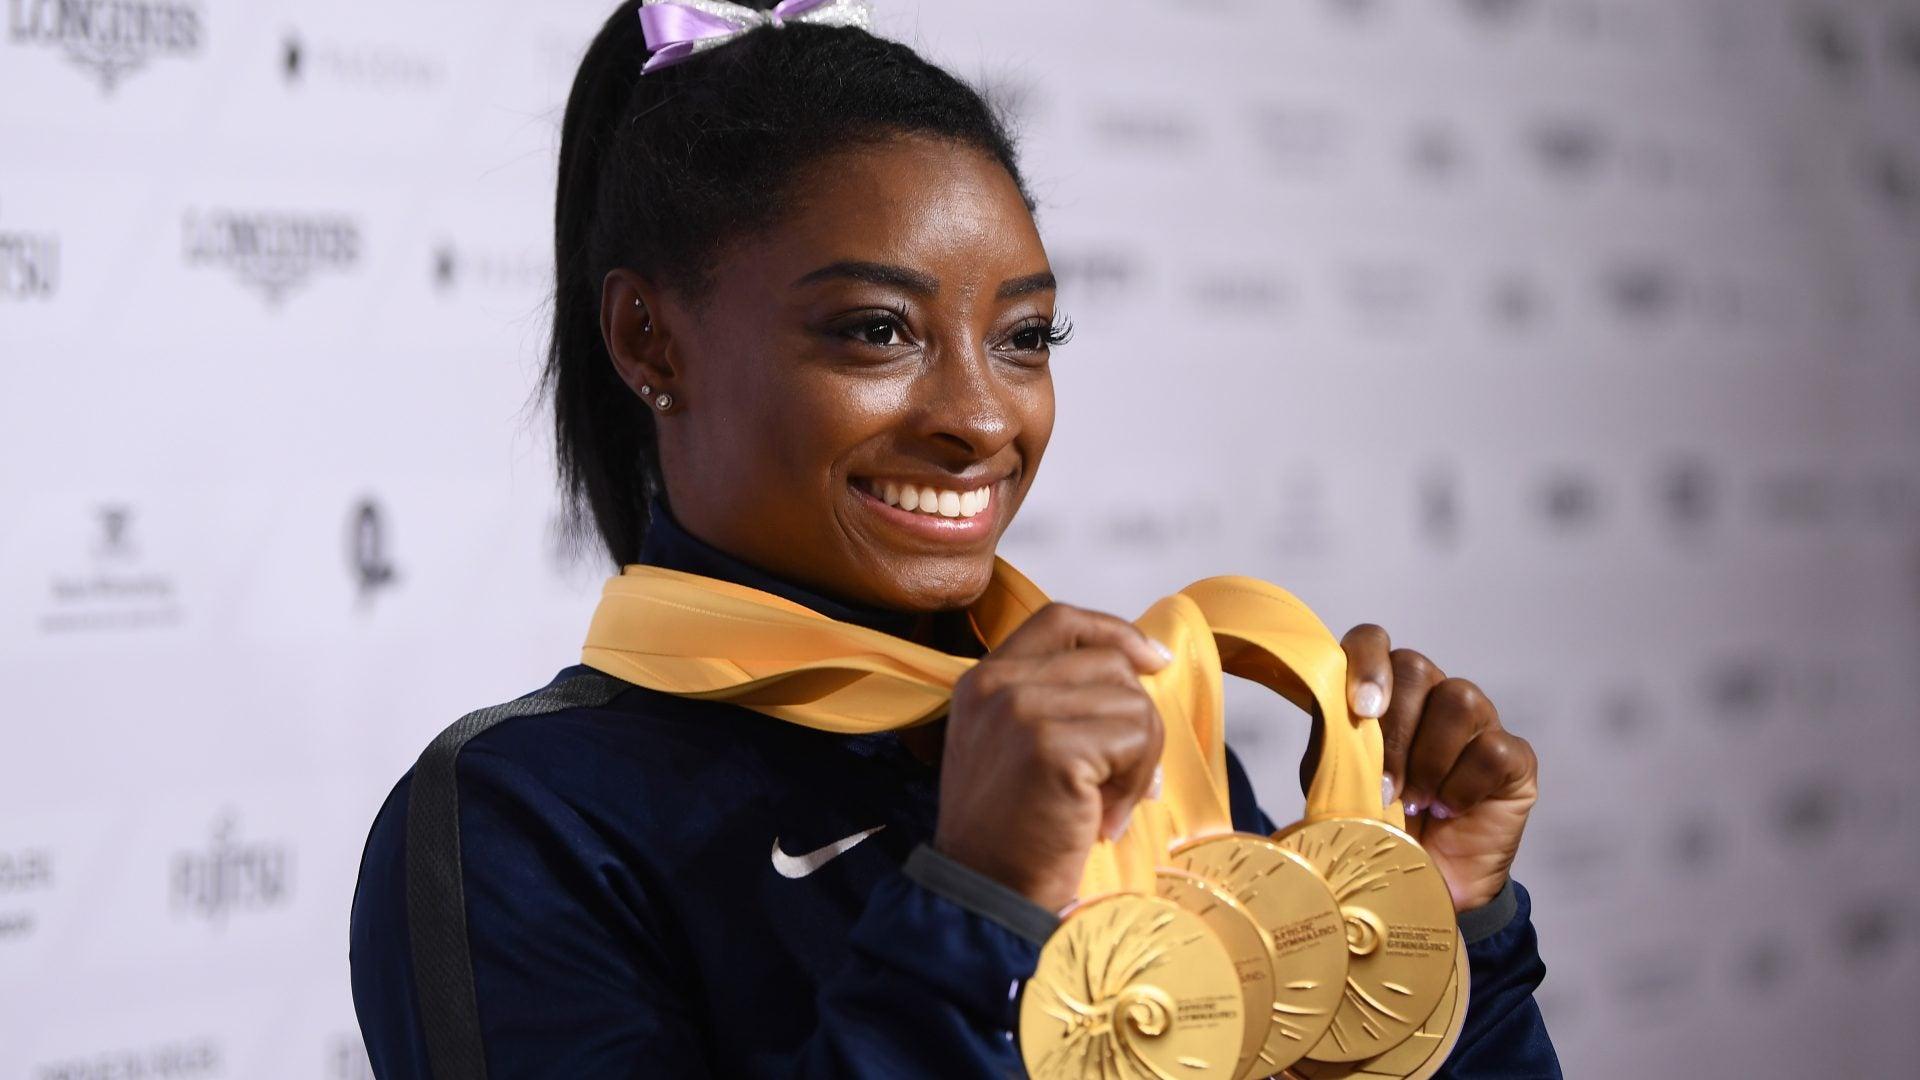 Simone Biles and Coco Gauff Hit Major Milestones In Sports